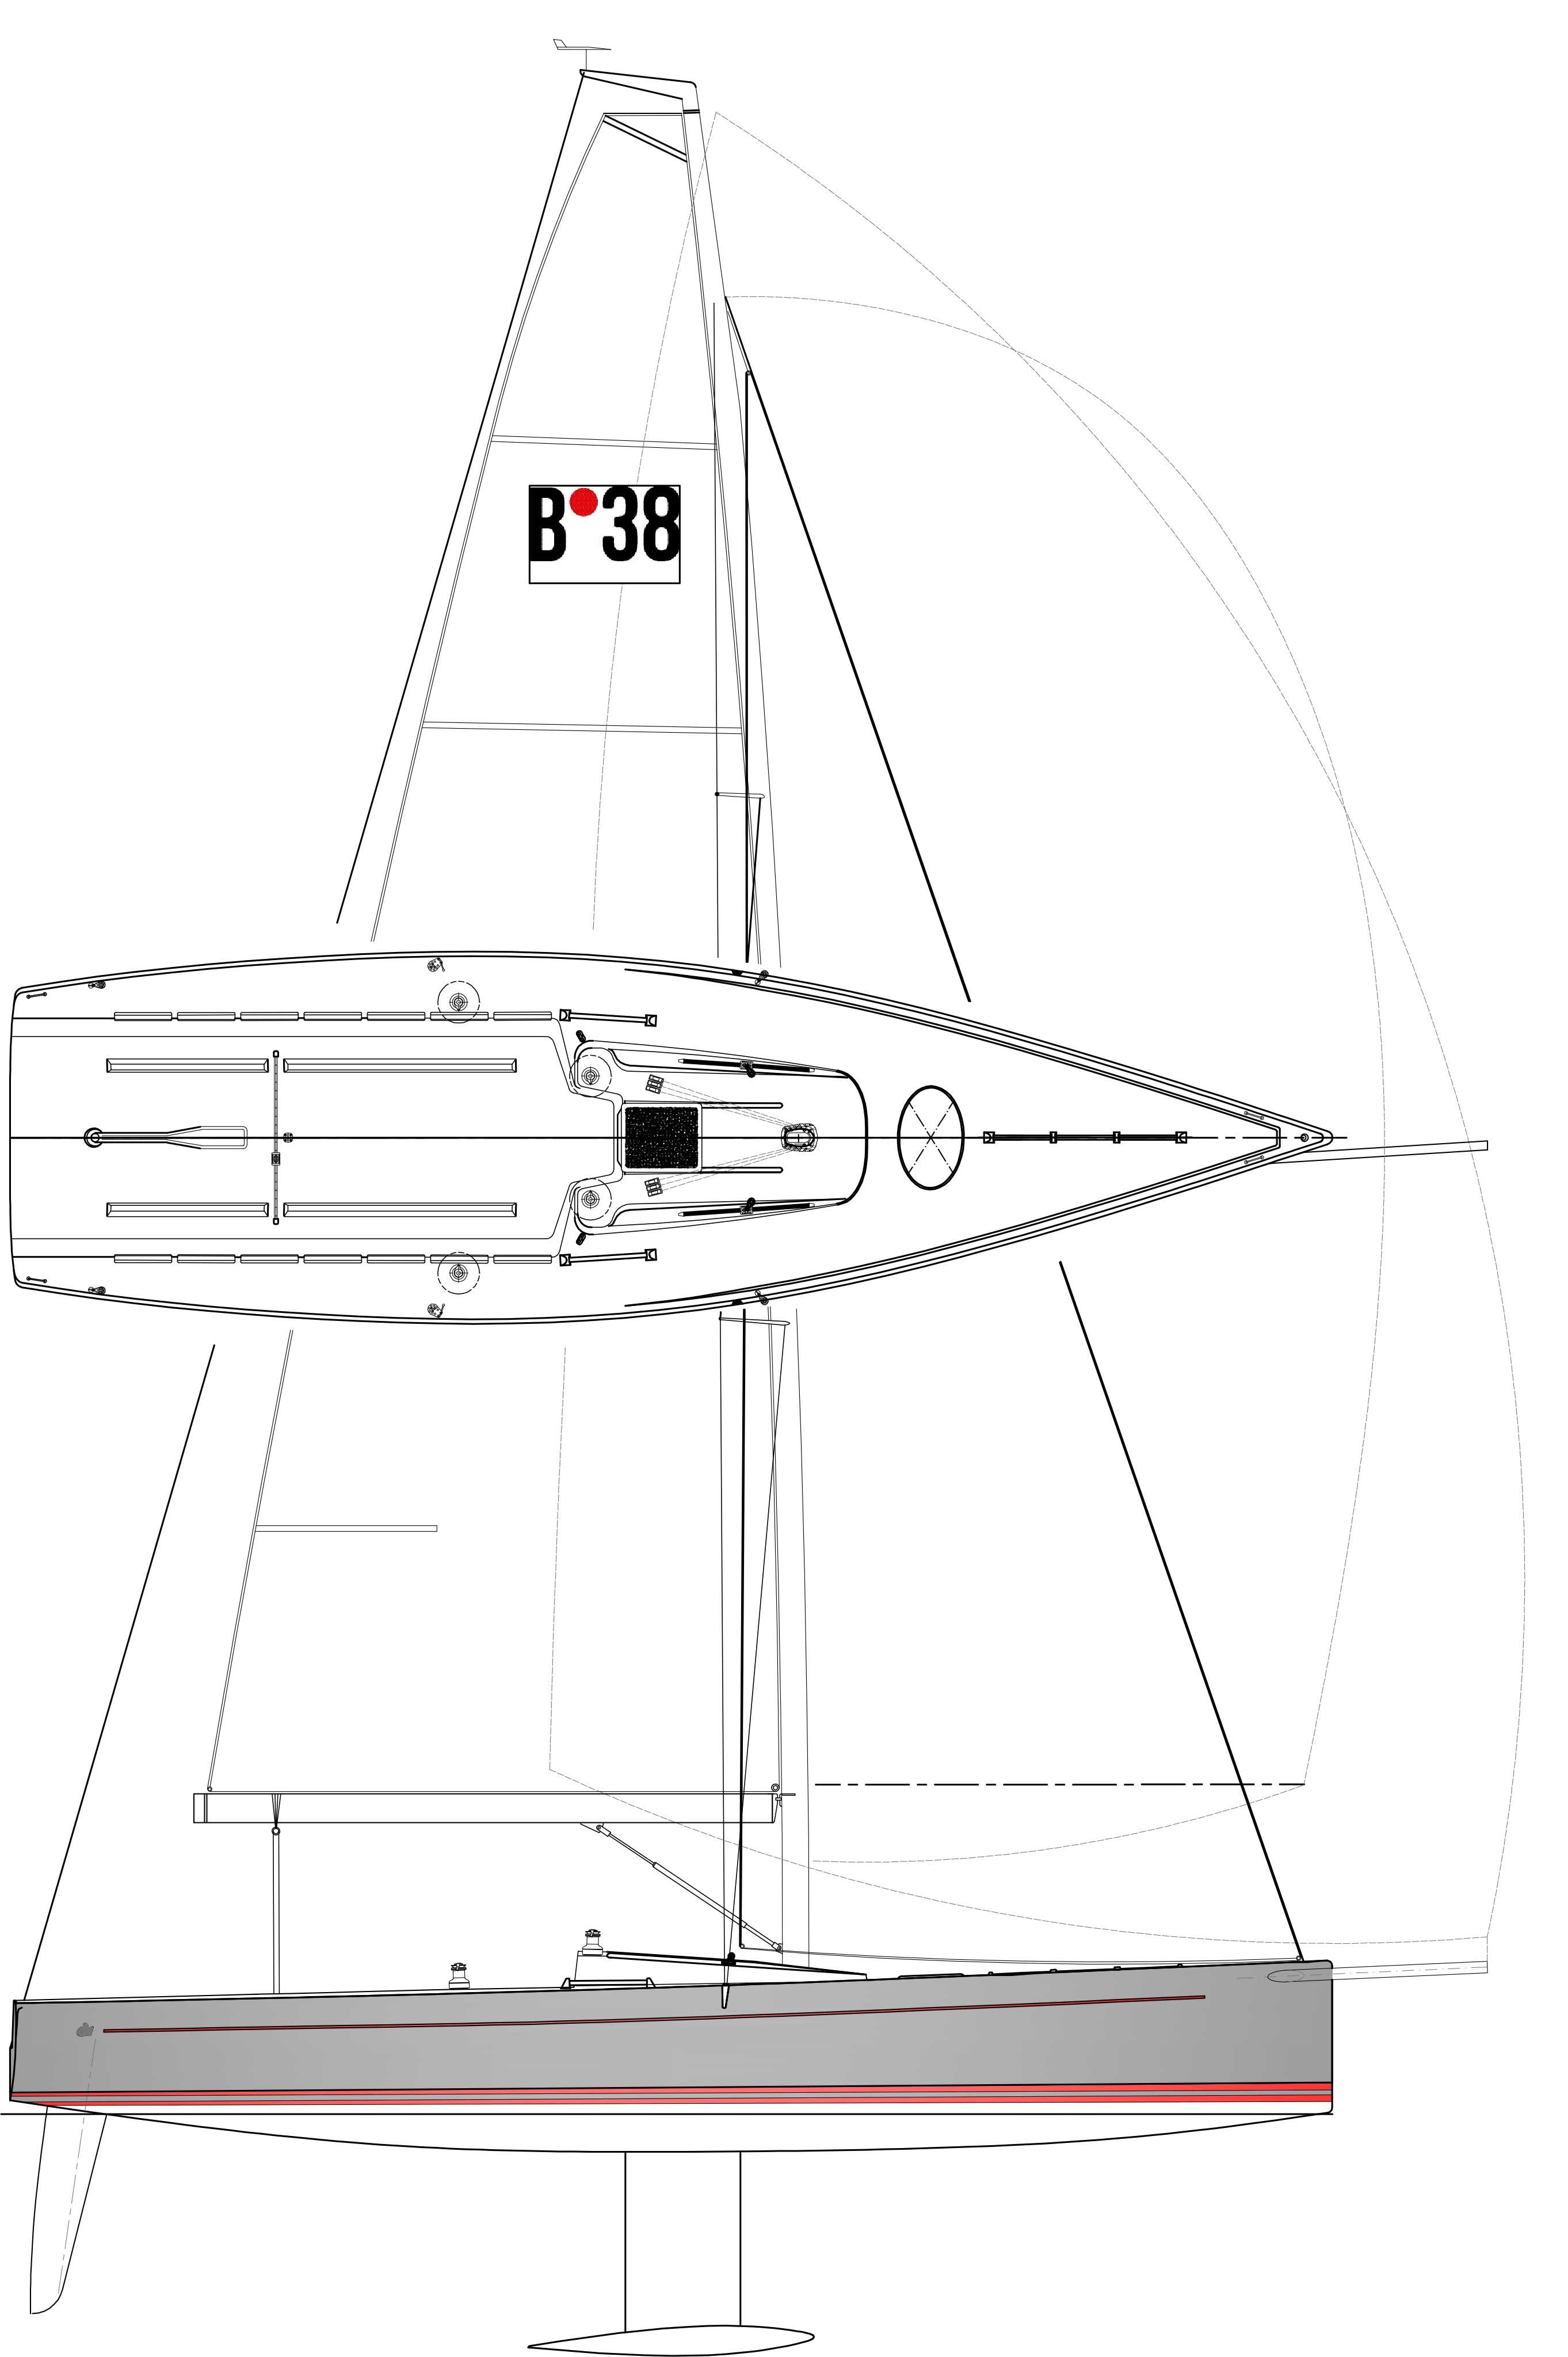 b38-drawing-new